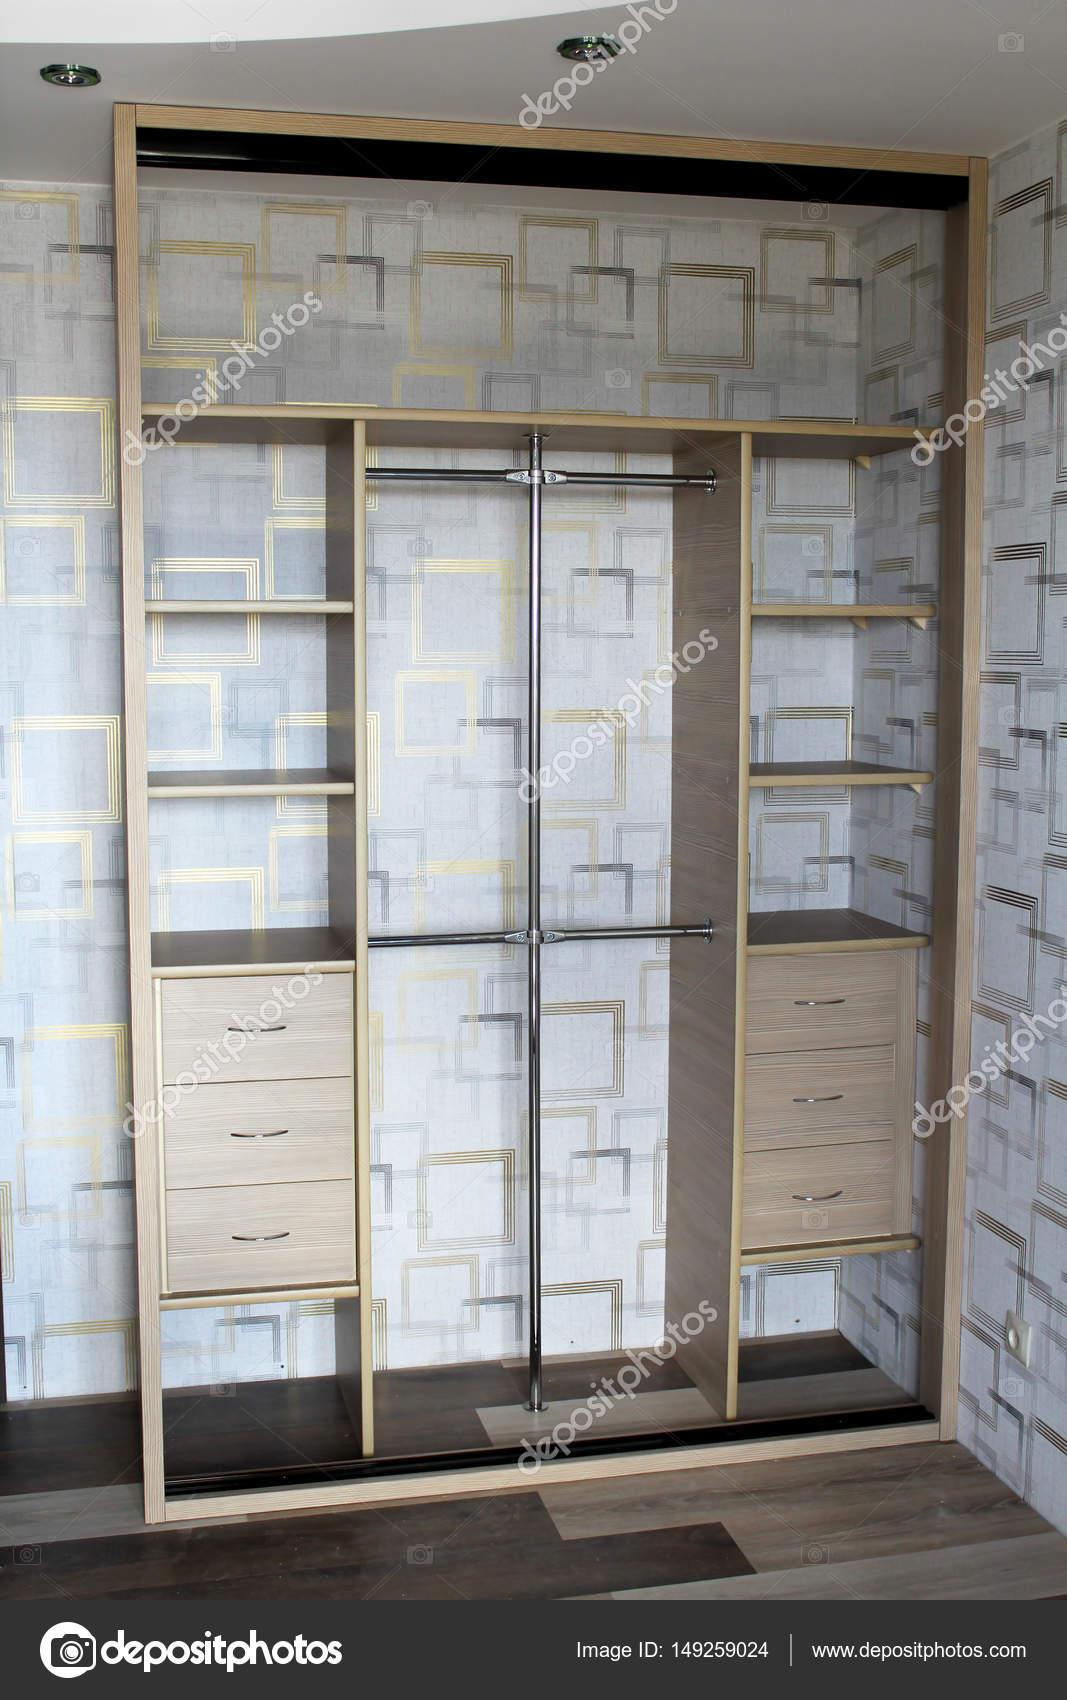 garde robe la fabrication de meubles design d interieur image de markasia